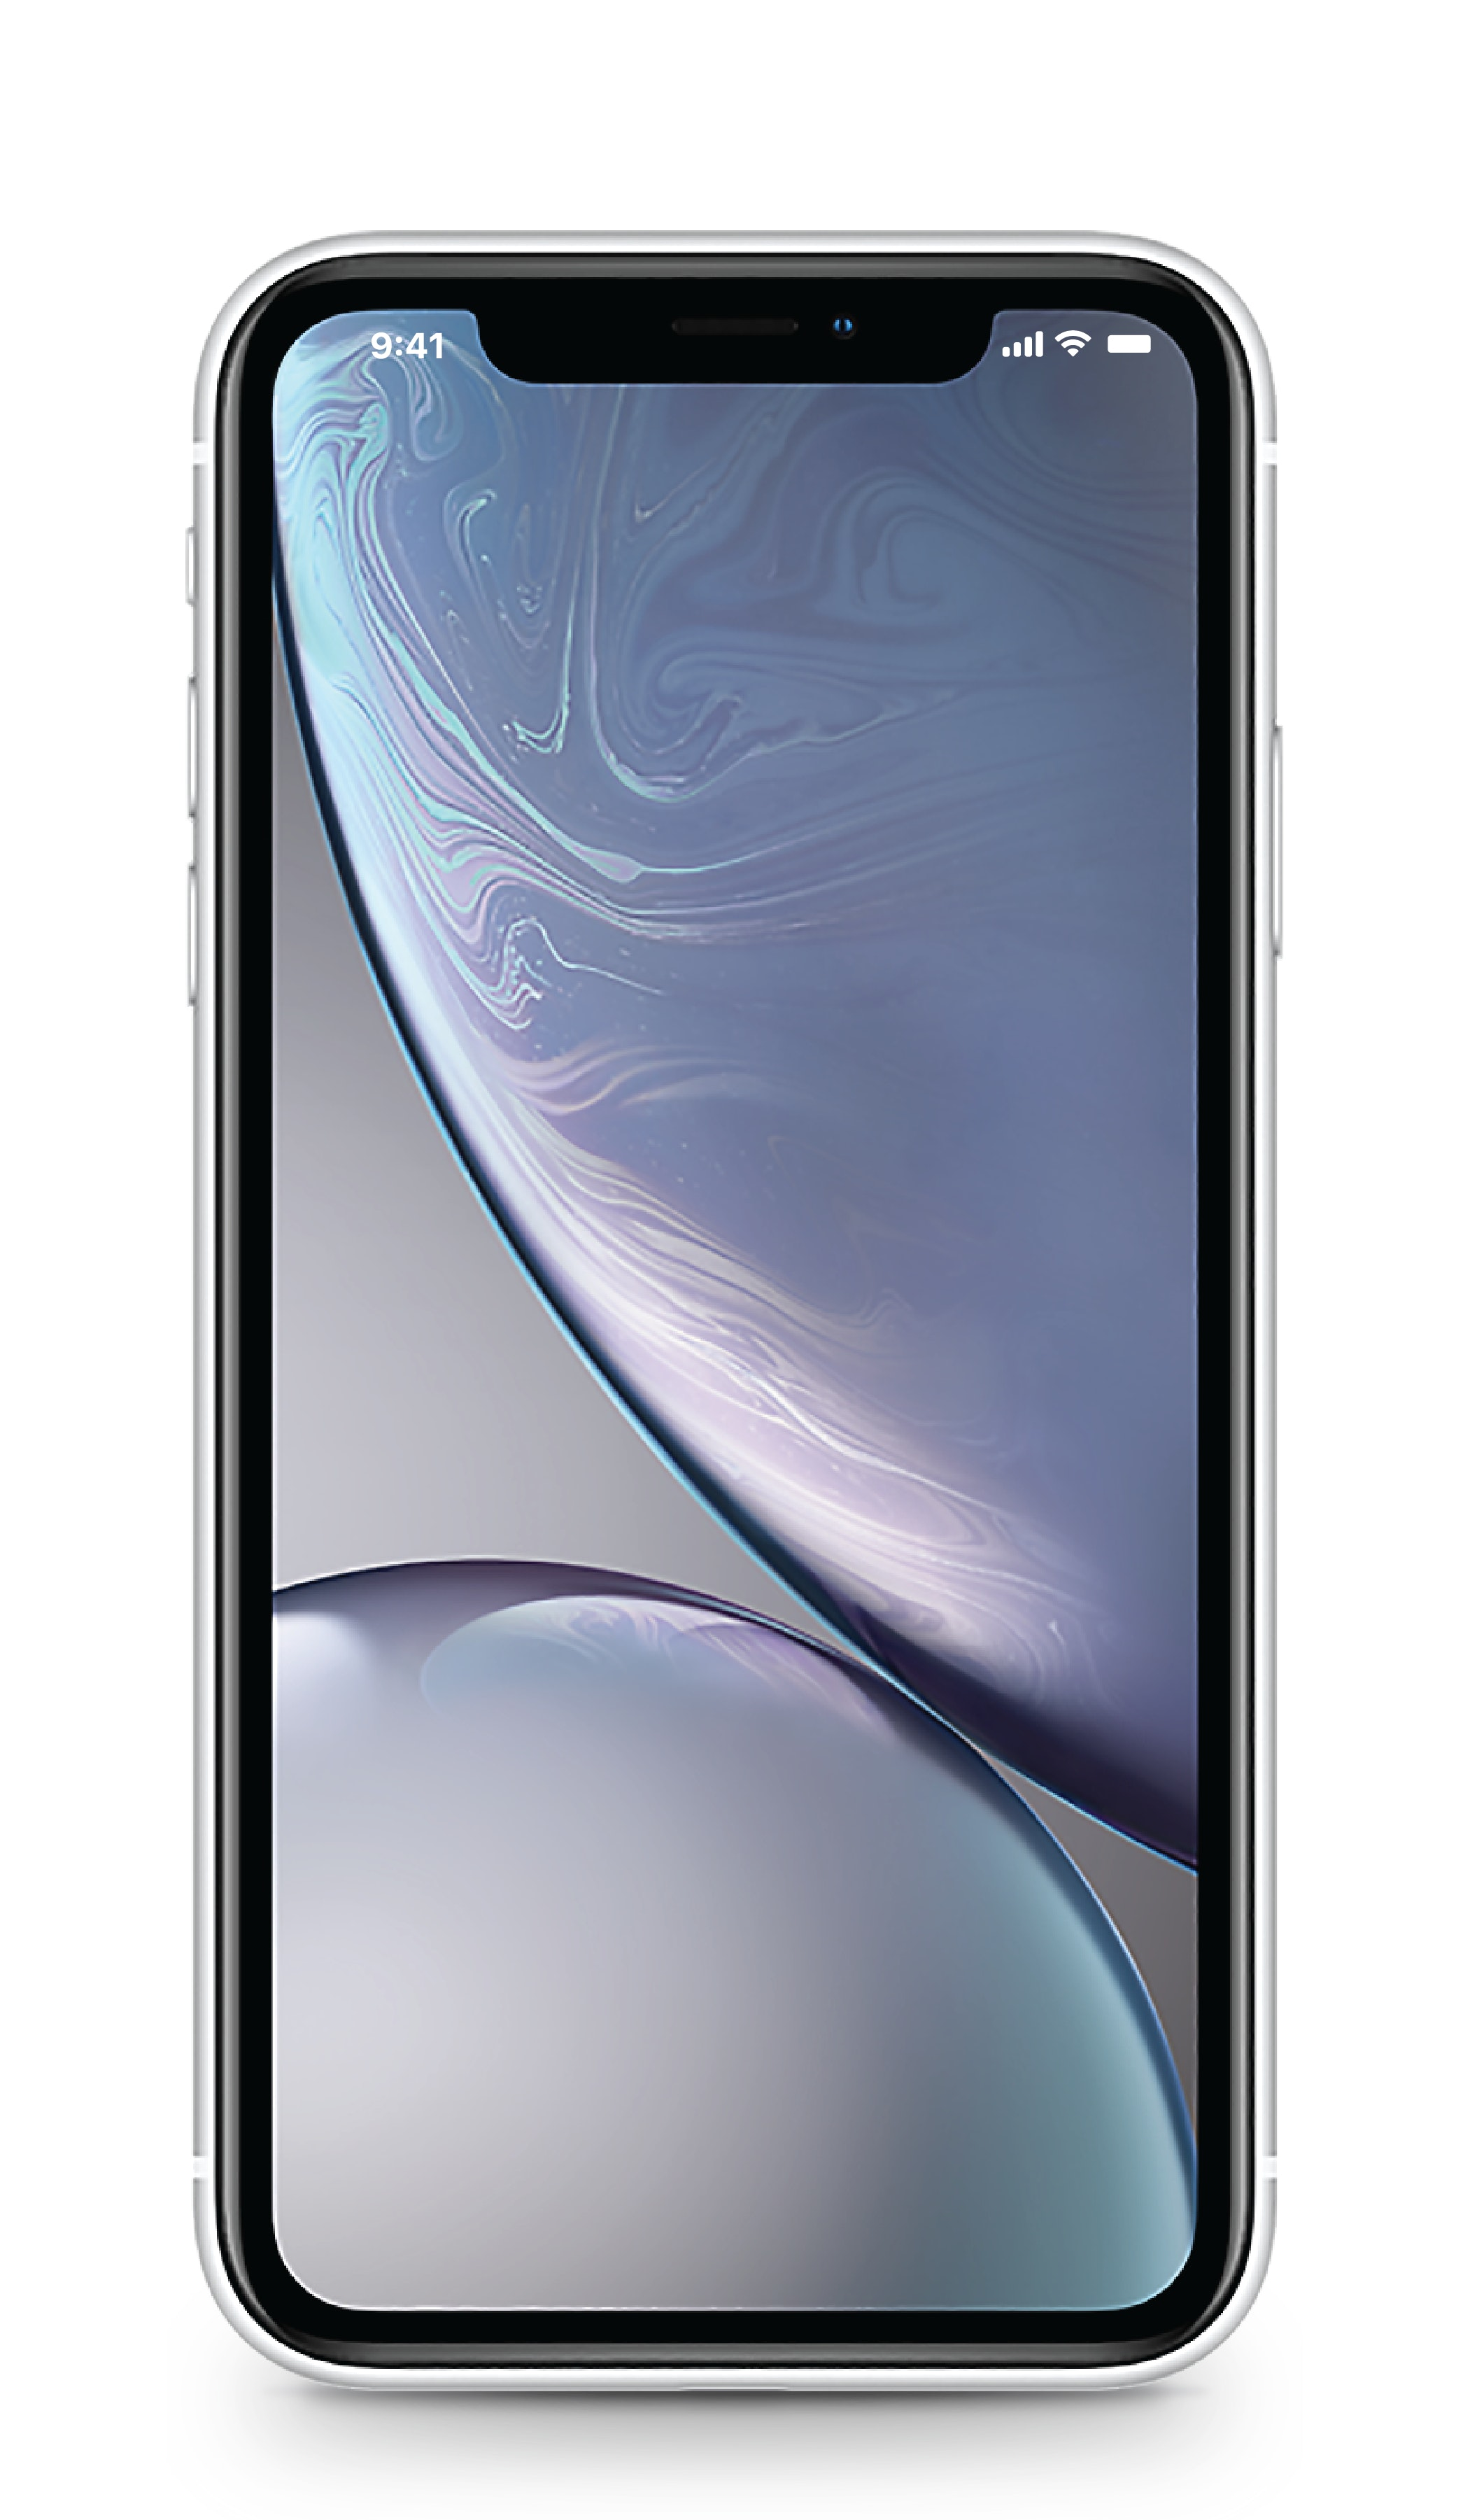 Apple iPhone XR image